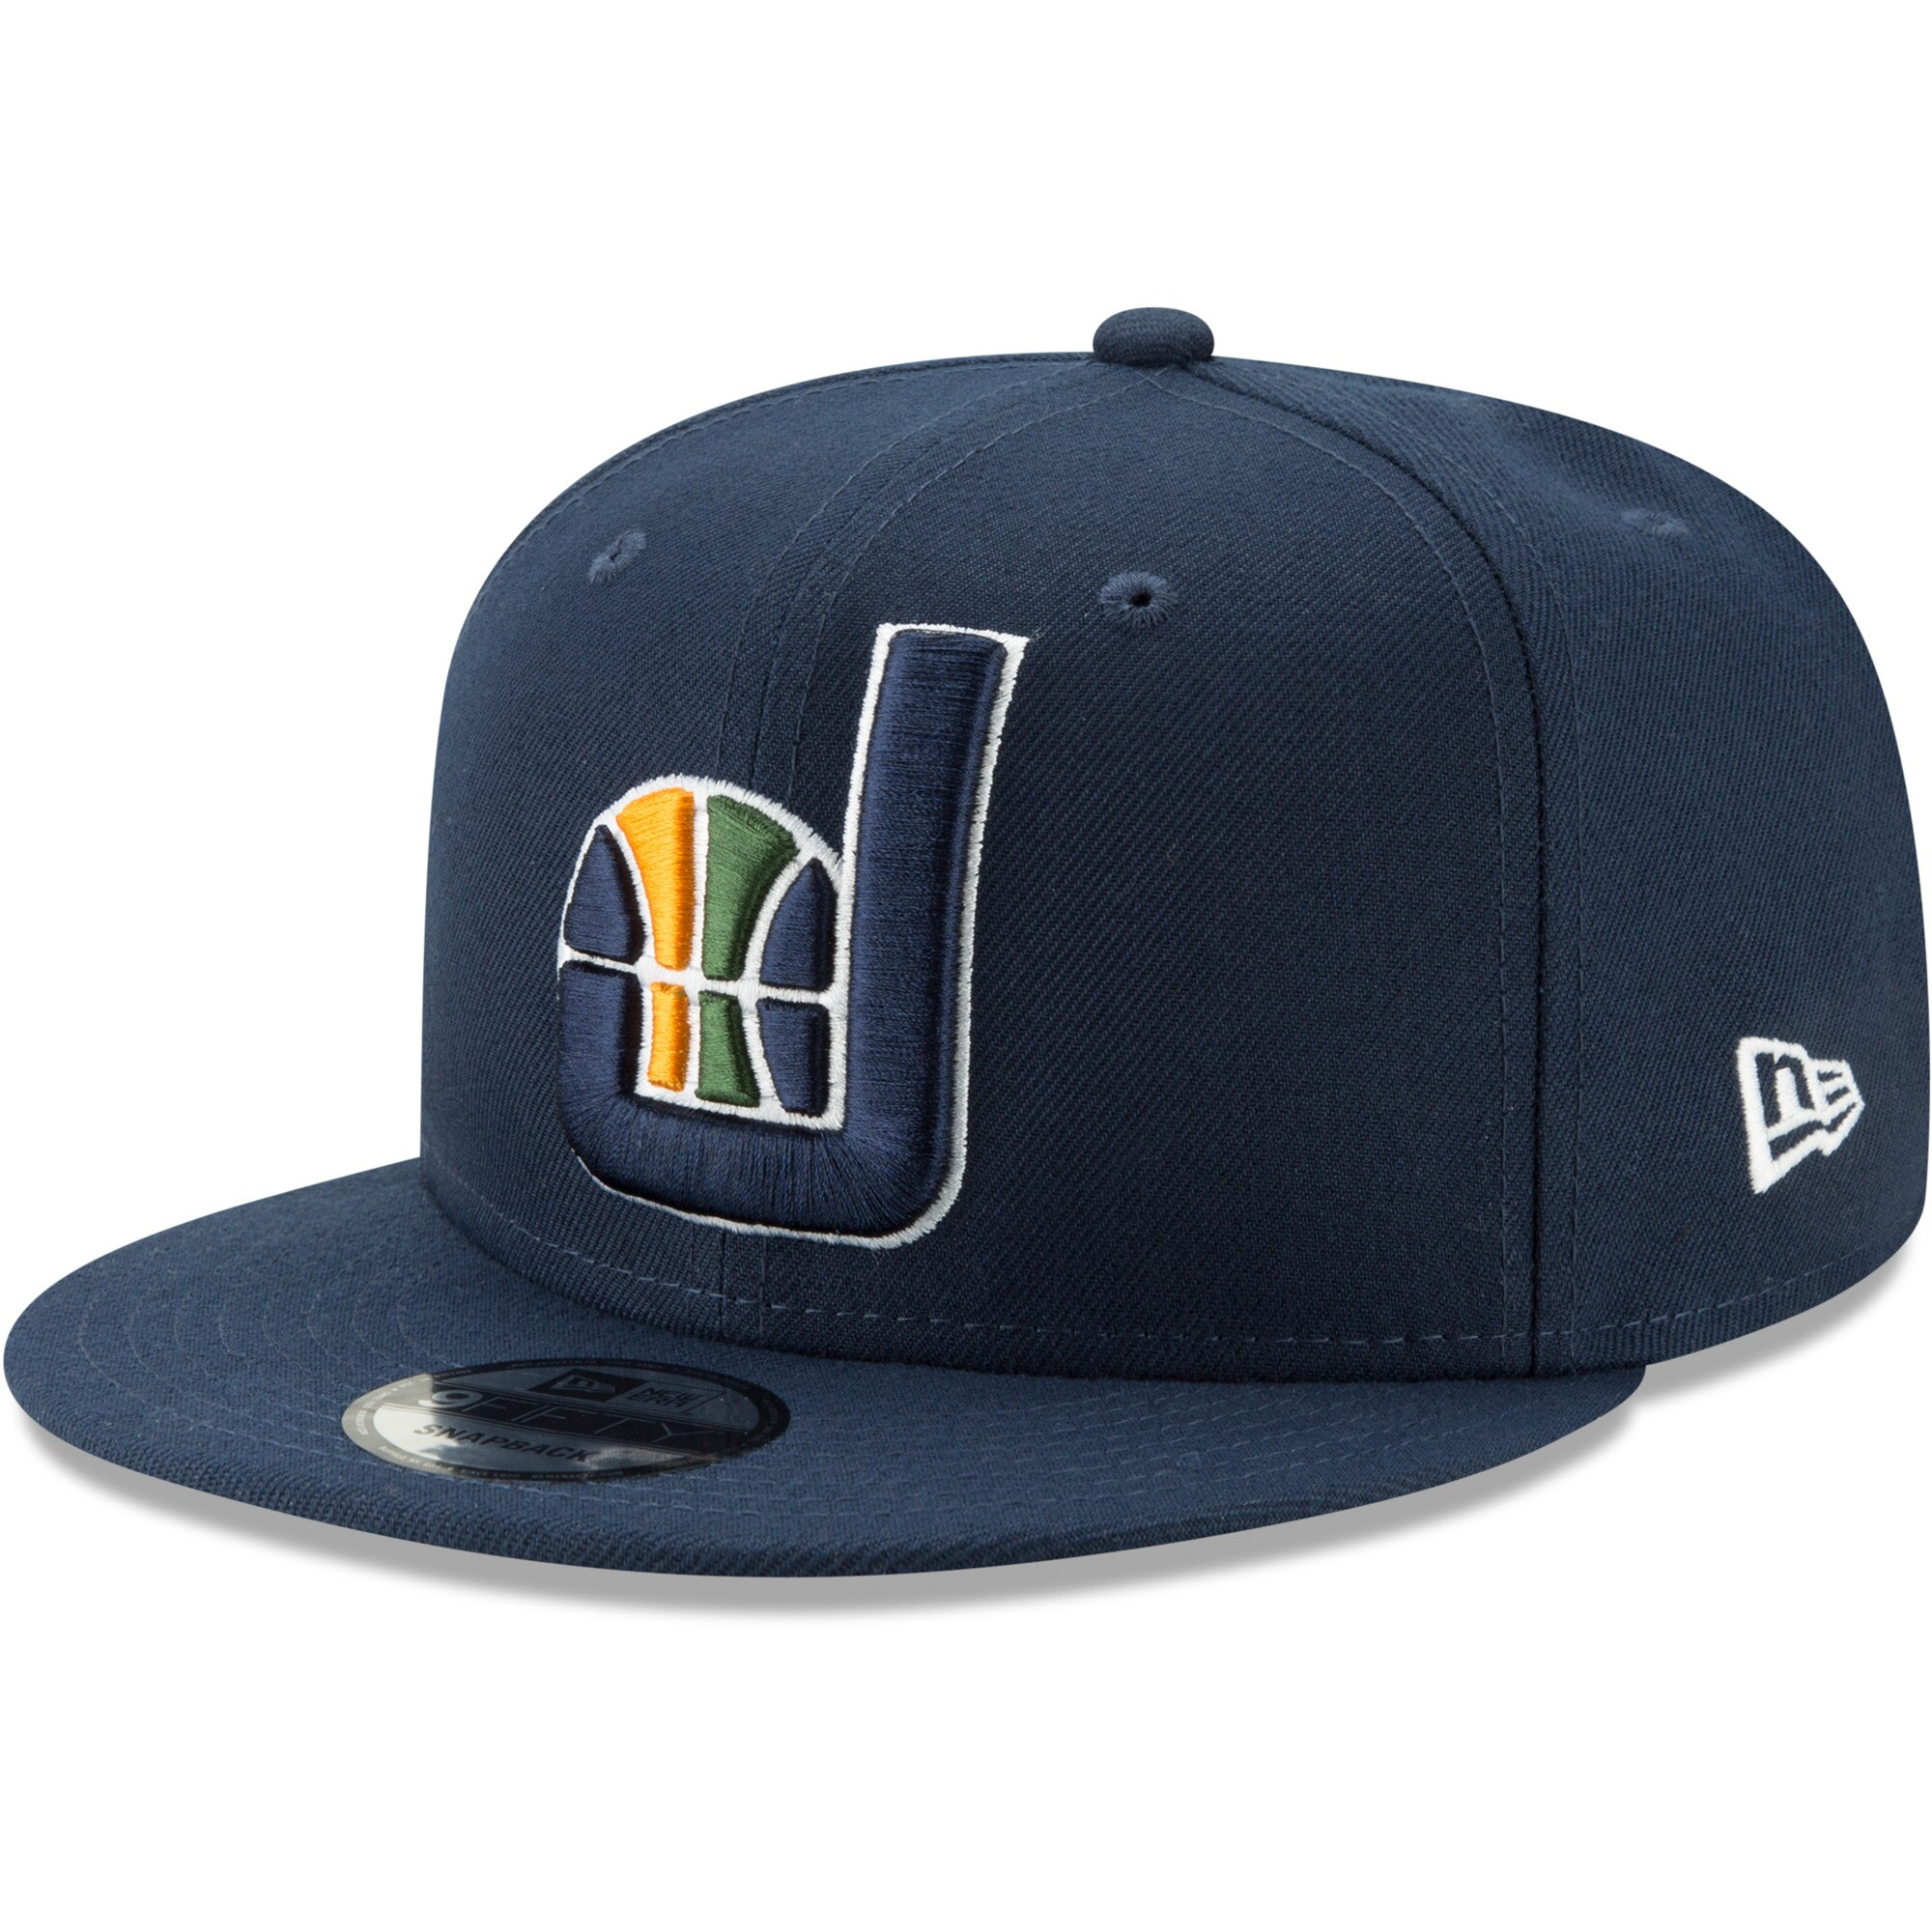 Utah Jazz New Era Back Half 9FIFTY Adjustable Hat - Navy